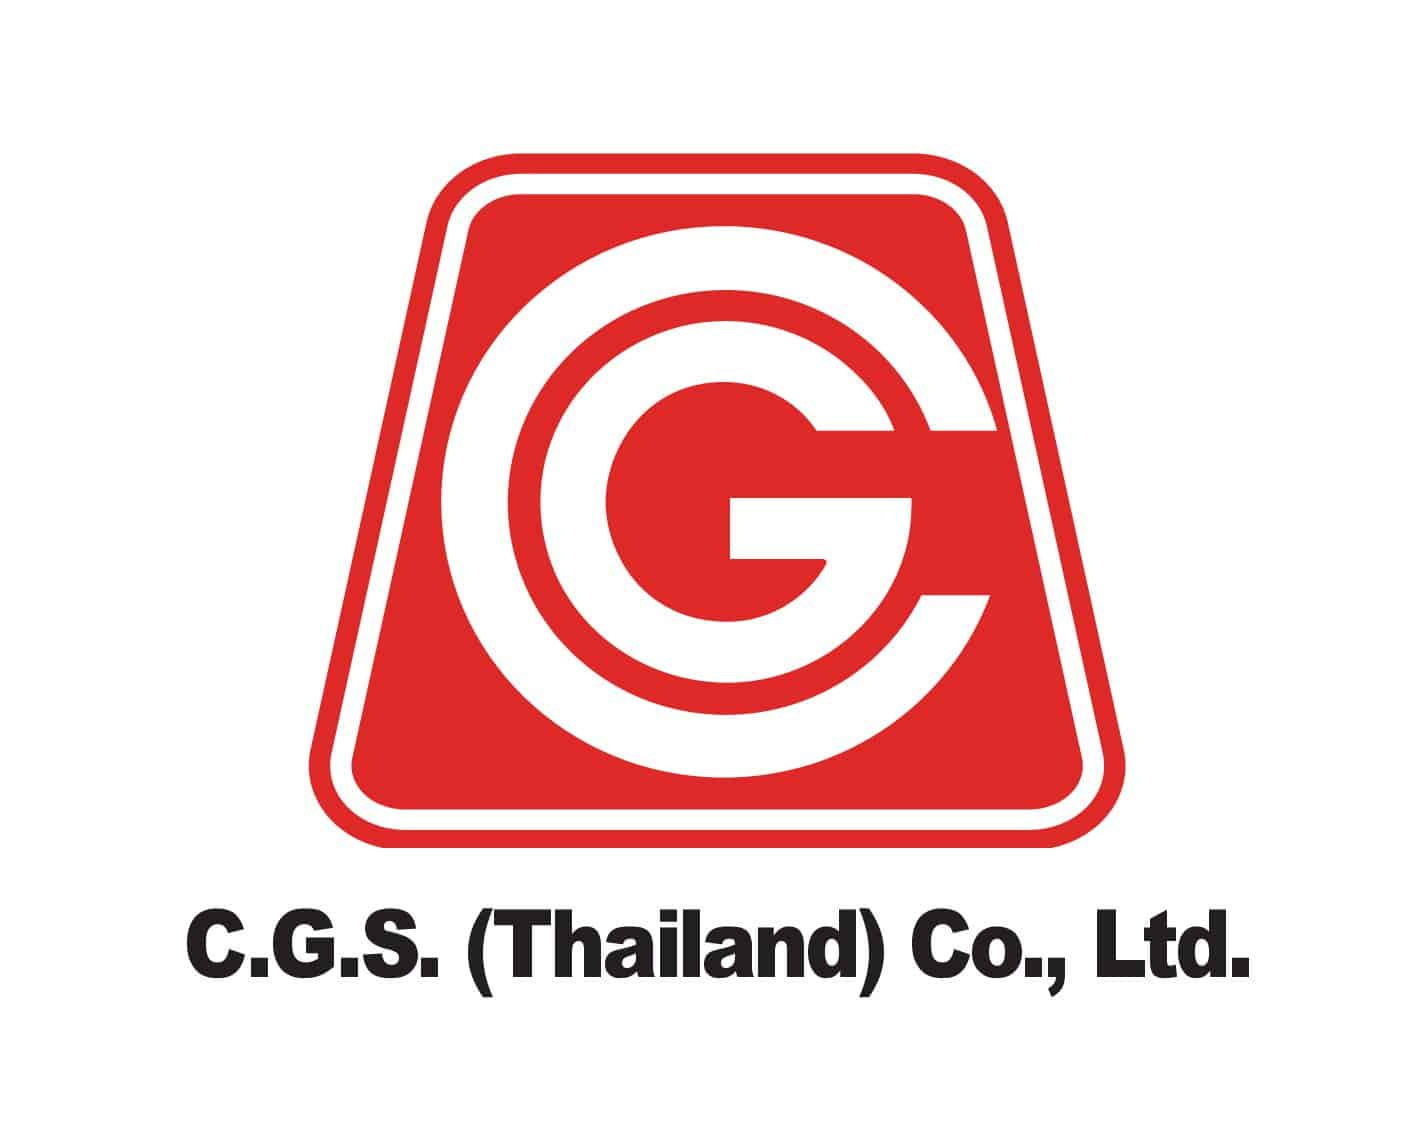 "<a href=""https://www.gs1th.org/cgsth/"">บริษัท ซี.จี.เอส (ประเทศไทย) จำกัด</a>"